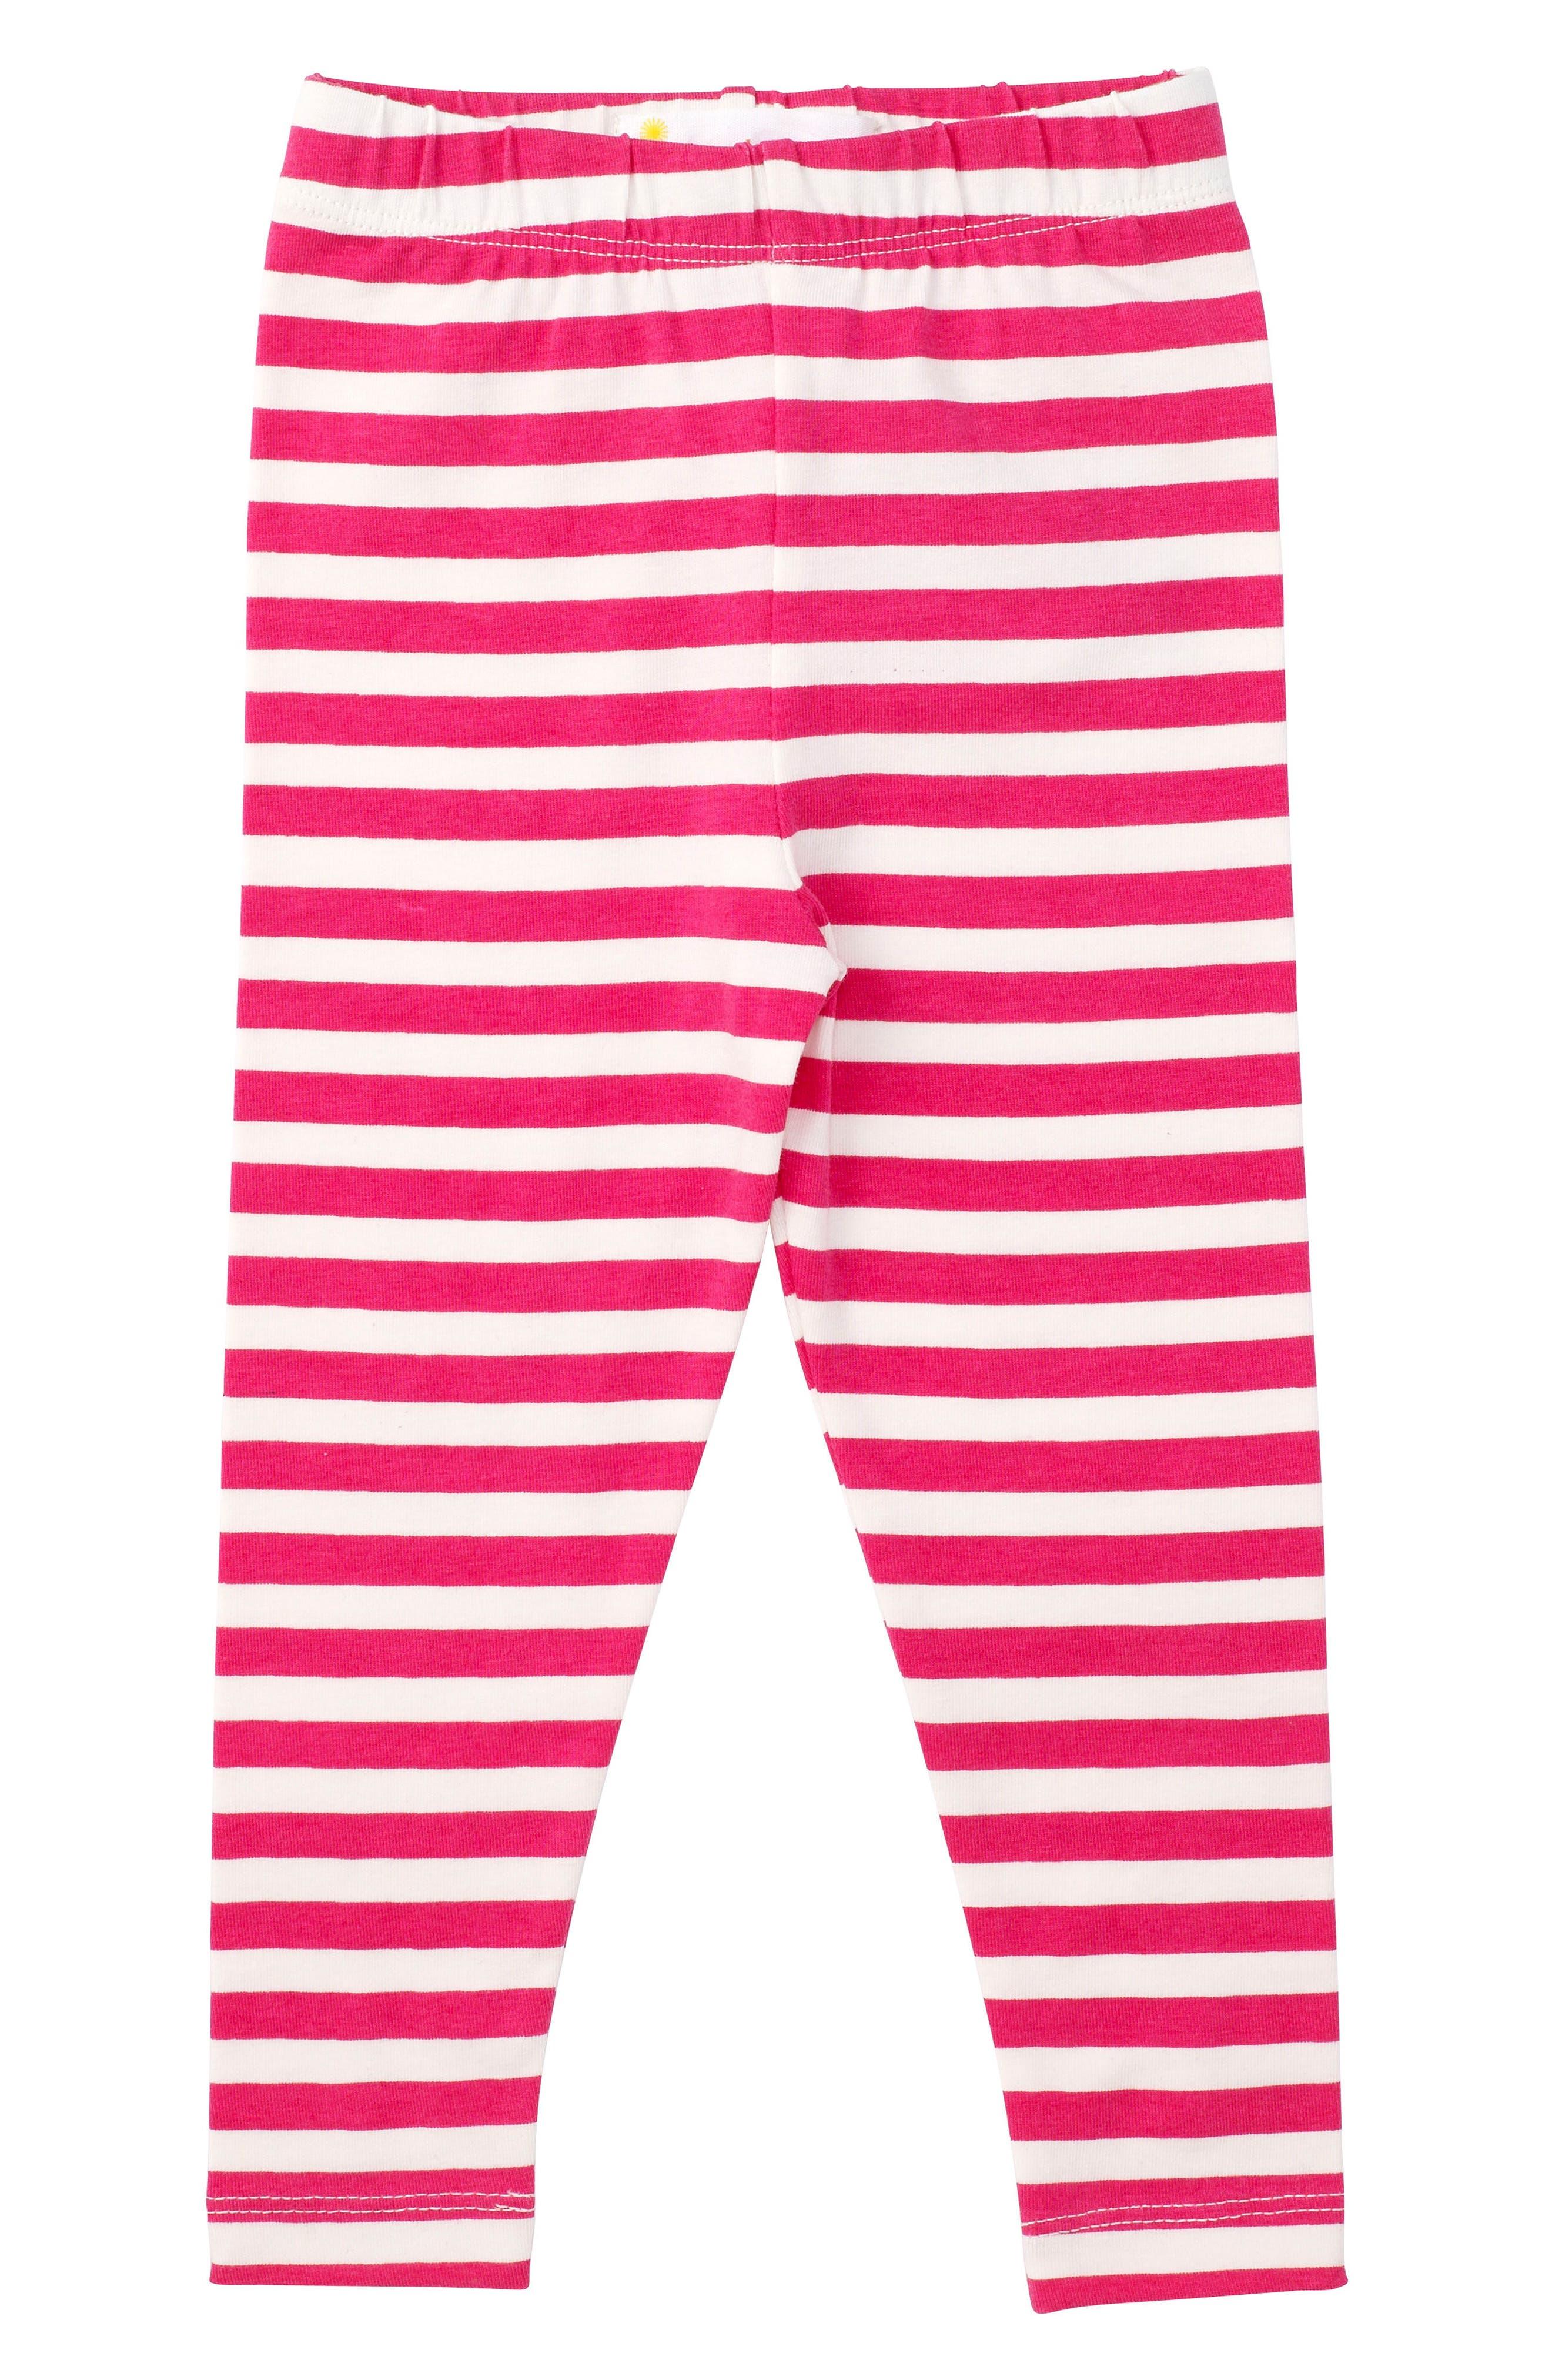 Alternate Image 1 Selected - Masala Baby Stripe Stretch Organic Cotton Leggings (Baby Girls)